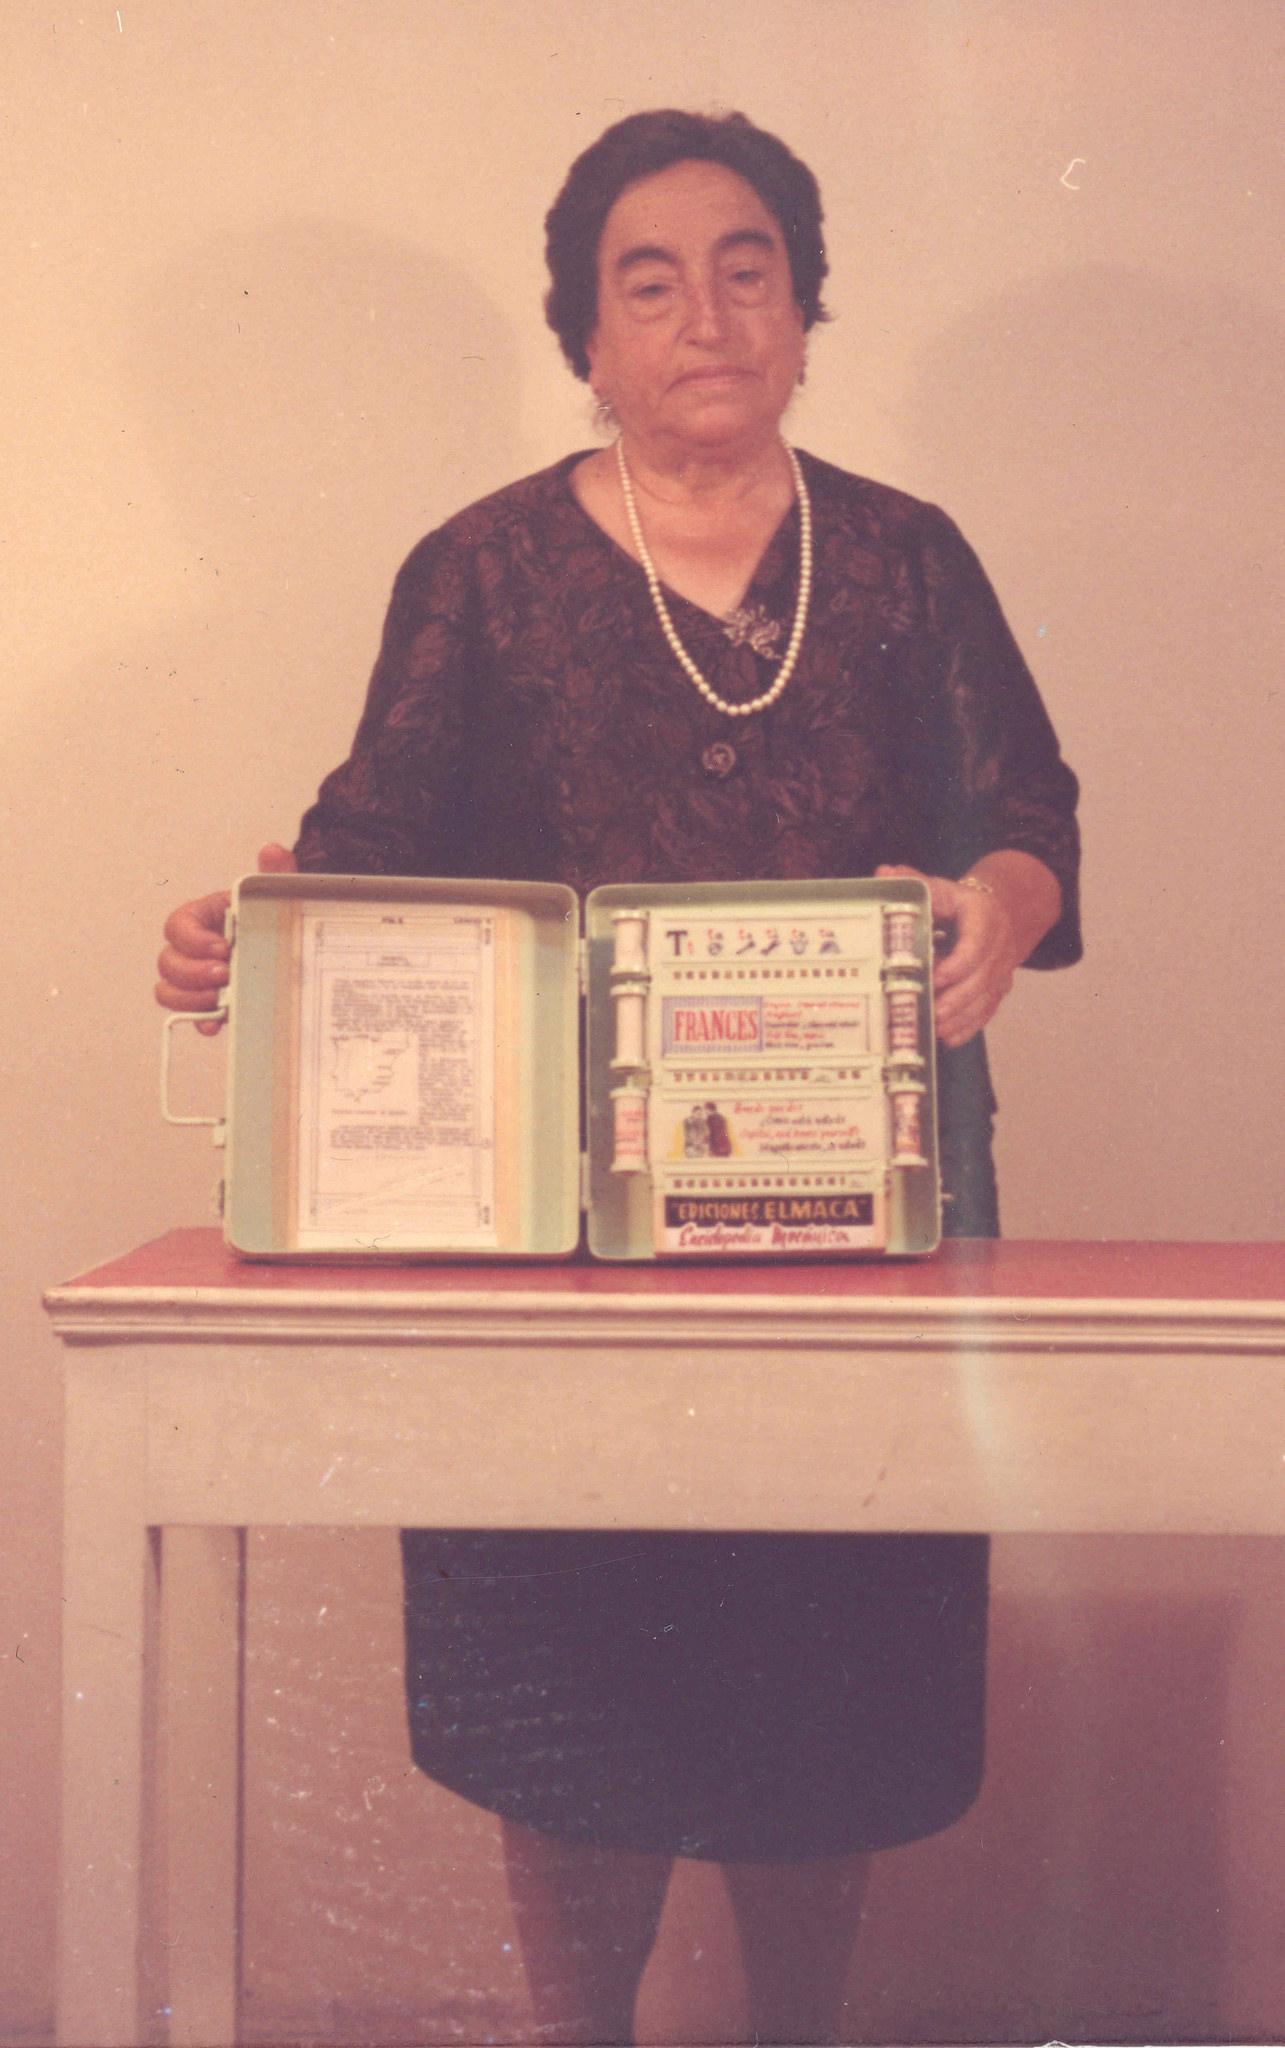 Angela Ruiz Robles